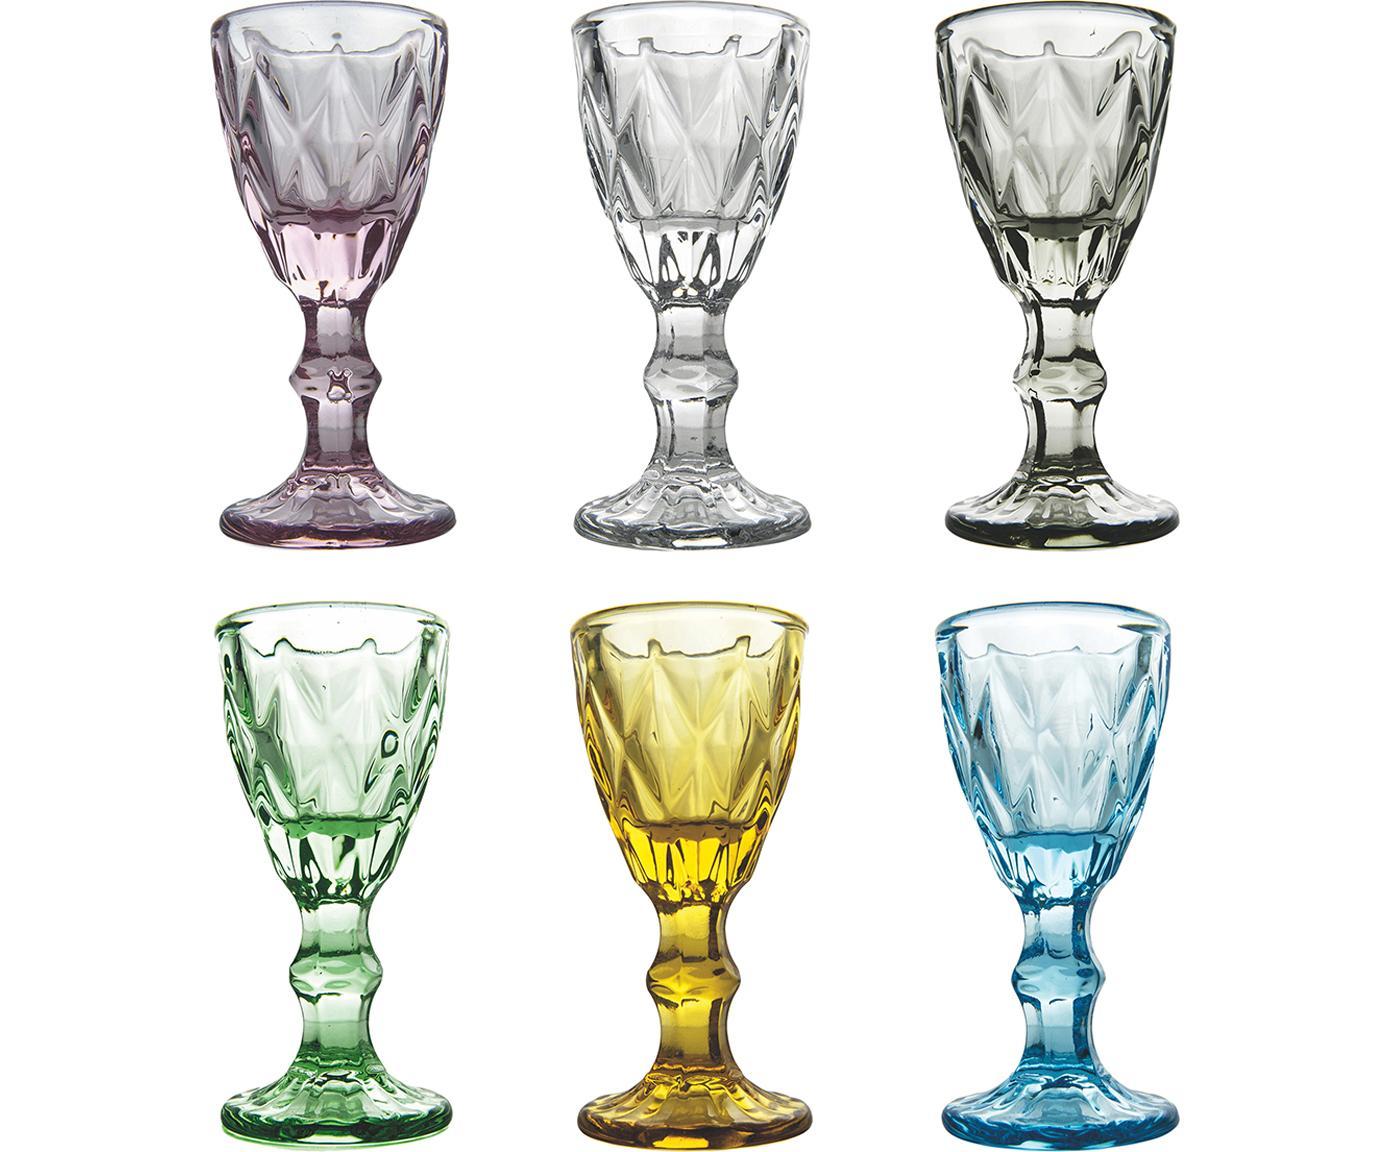 Schnapsgläser Prisma, 6er-Set, Glas, Mehrfarbig, Ø 5 x H 11 cm